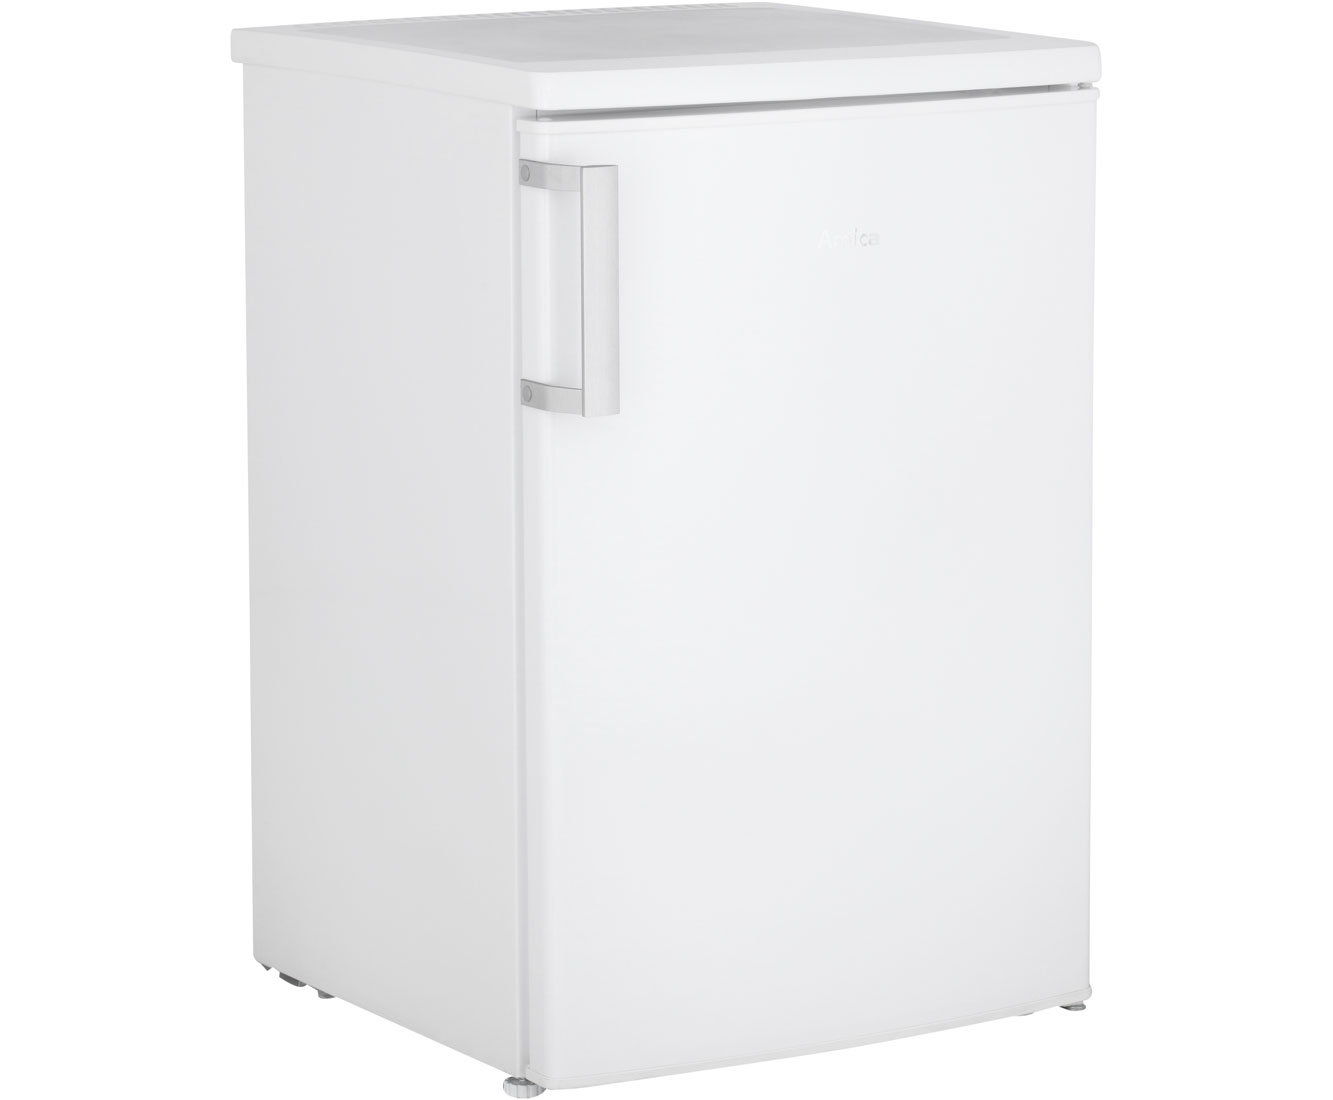 Amica Kühlschrank Pink : Rabatt preisvergleich.de haushalt u003e kühlschränke